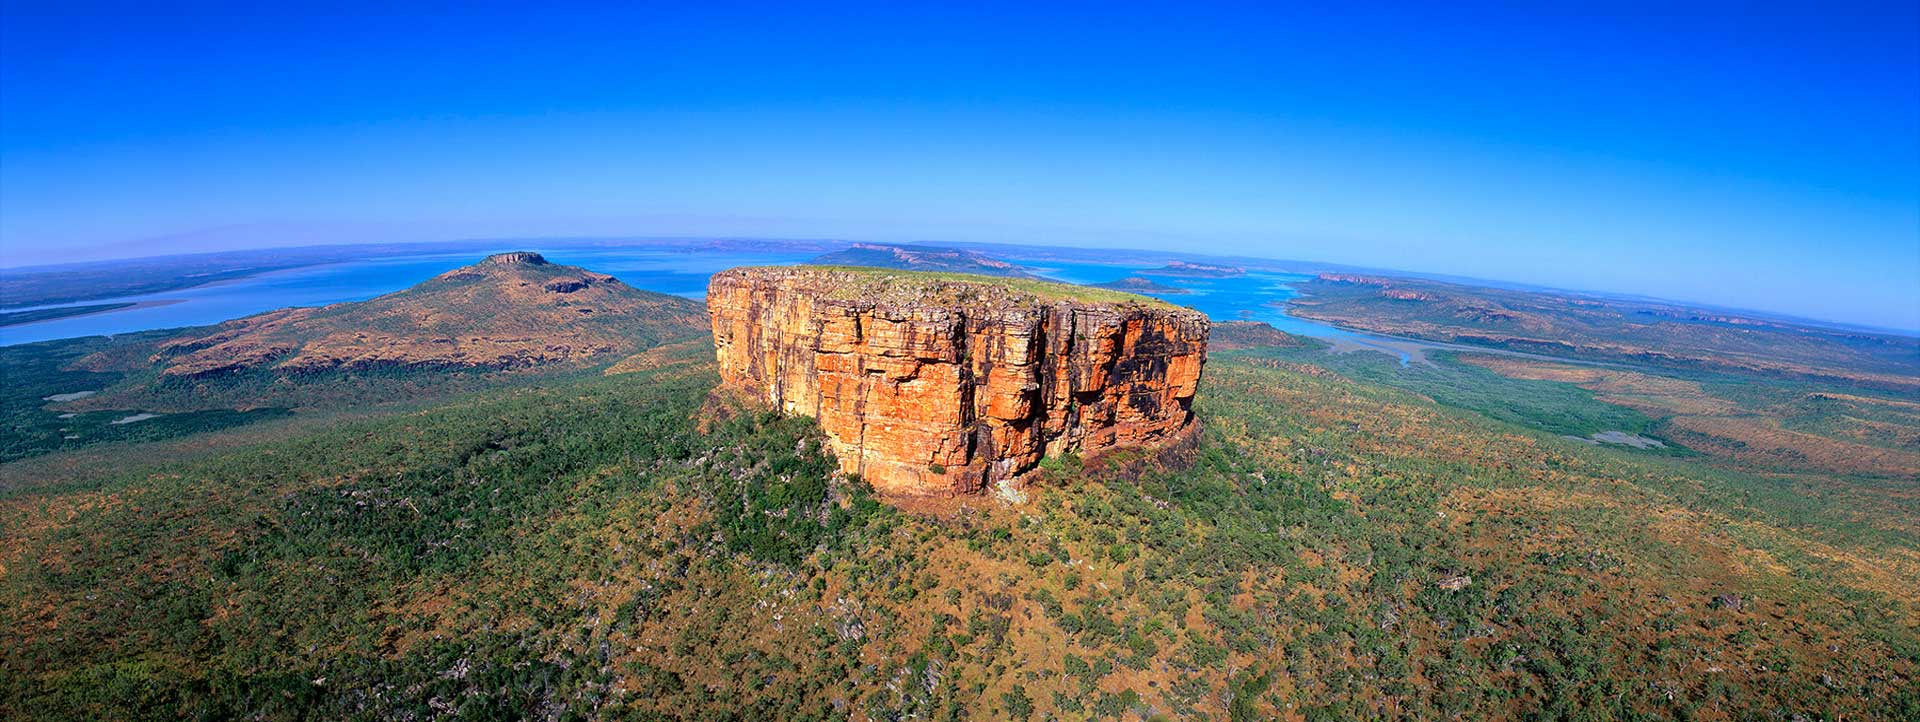 MT-TRAFALGAR-Kimberley-aerial-Auscapes